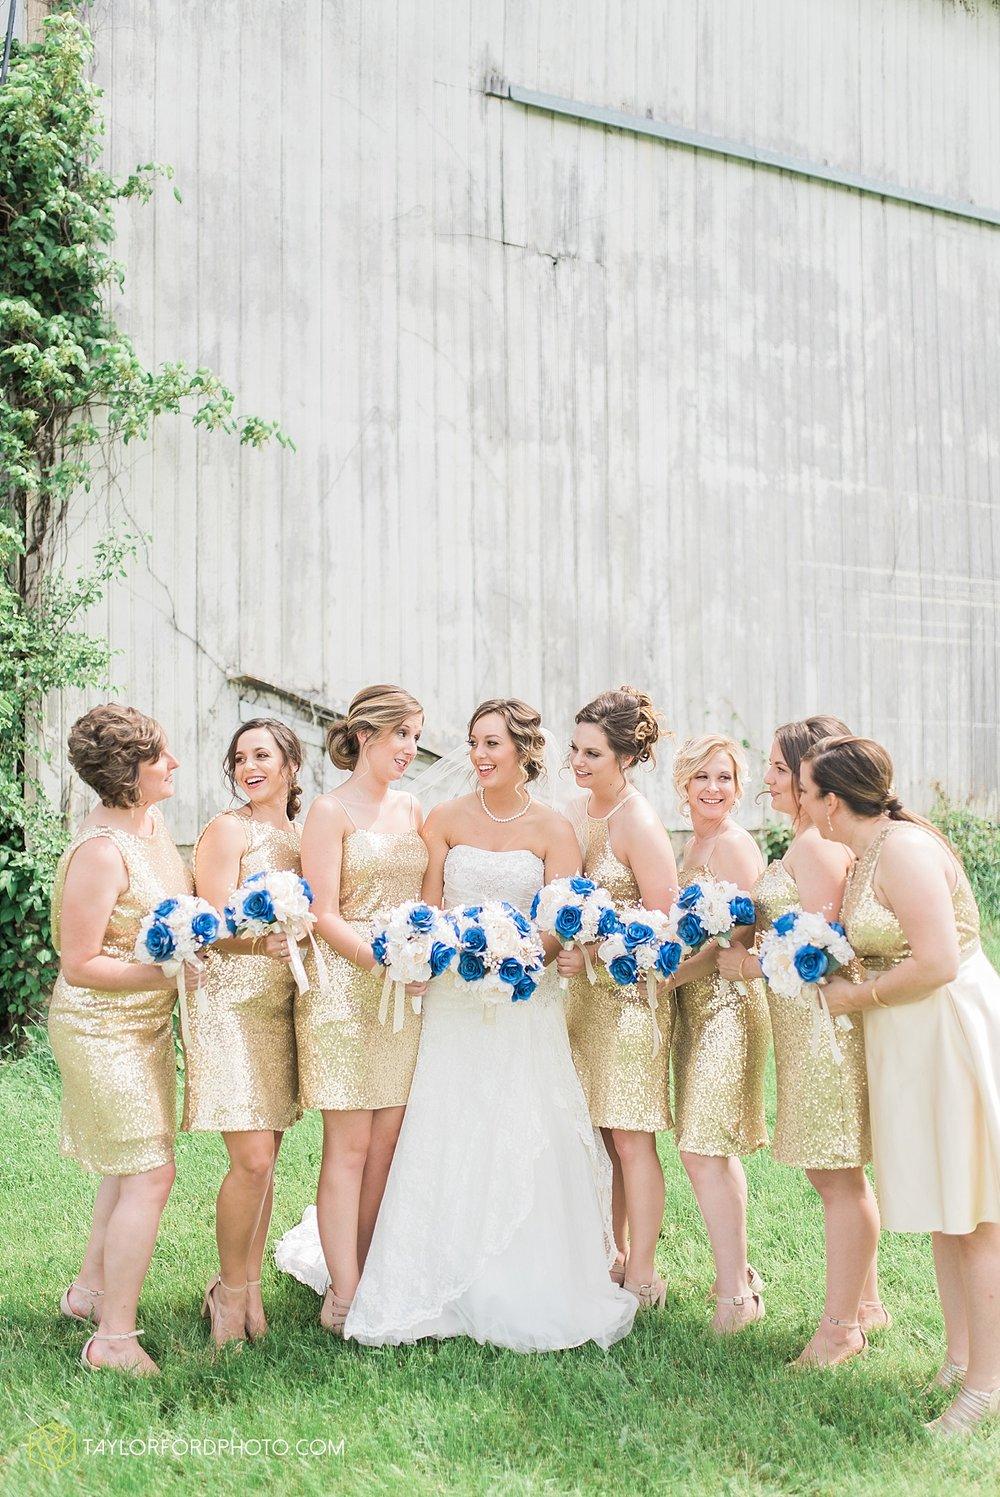 van-wert-ohio-decatur-indiana-wedding-photographer-the-mirage-banquet-hall-taylor-ford-photography_2495.jpg